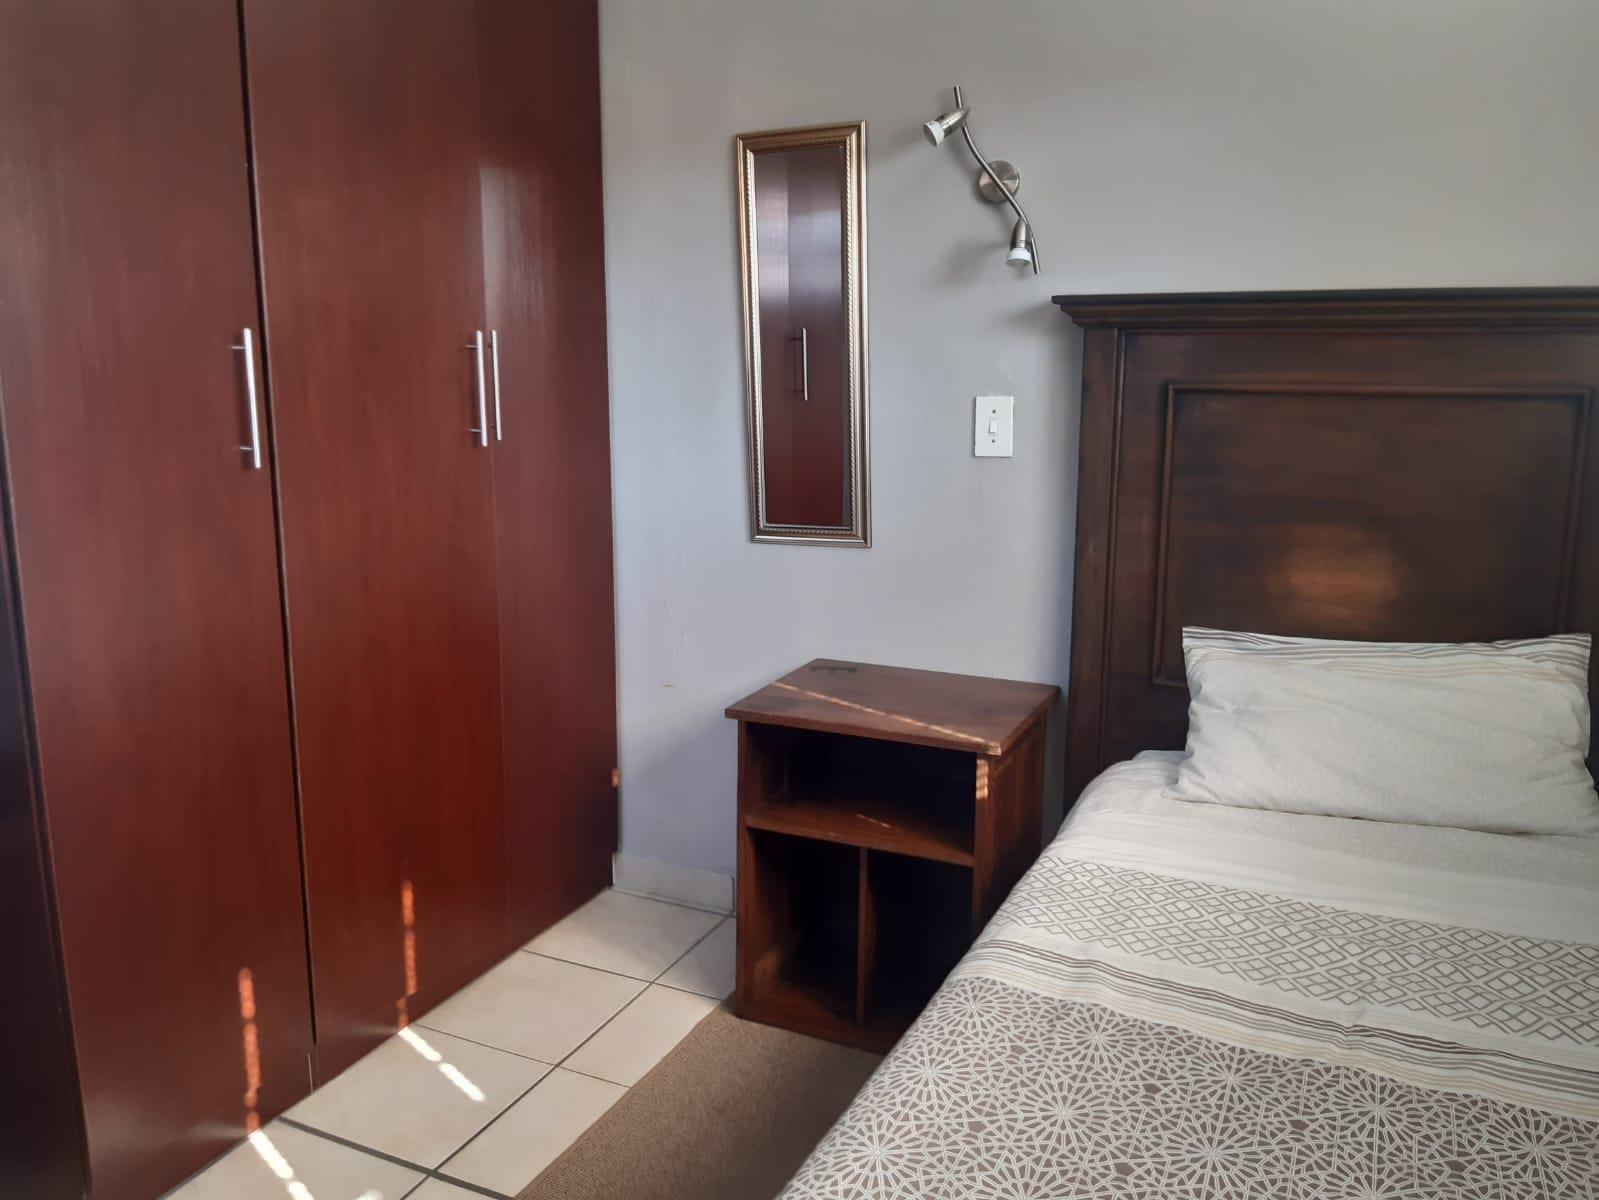 1 Bedroom House To Rent in Groenkloof